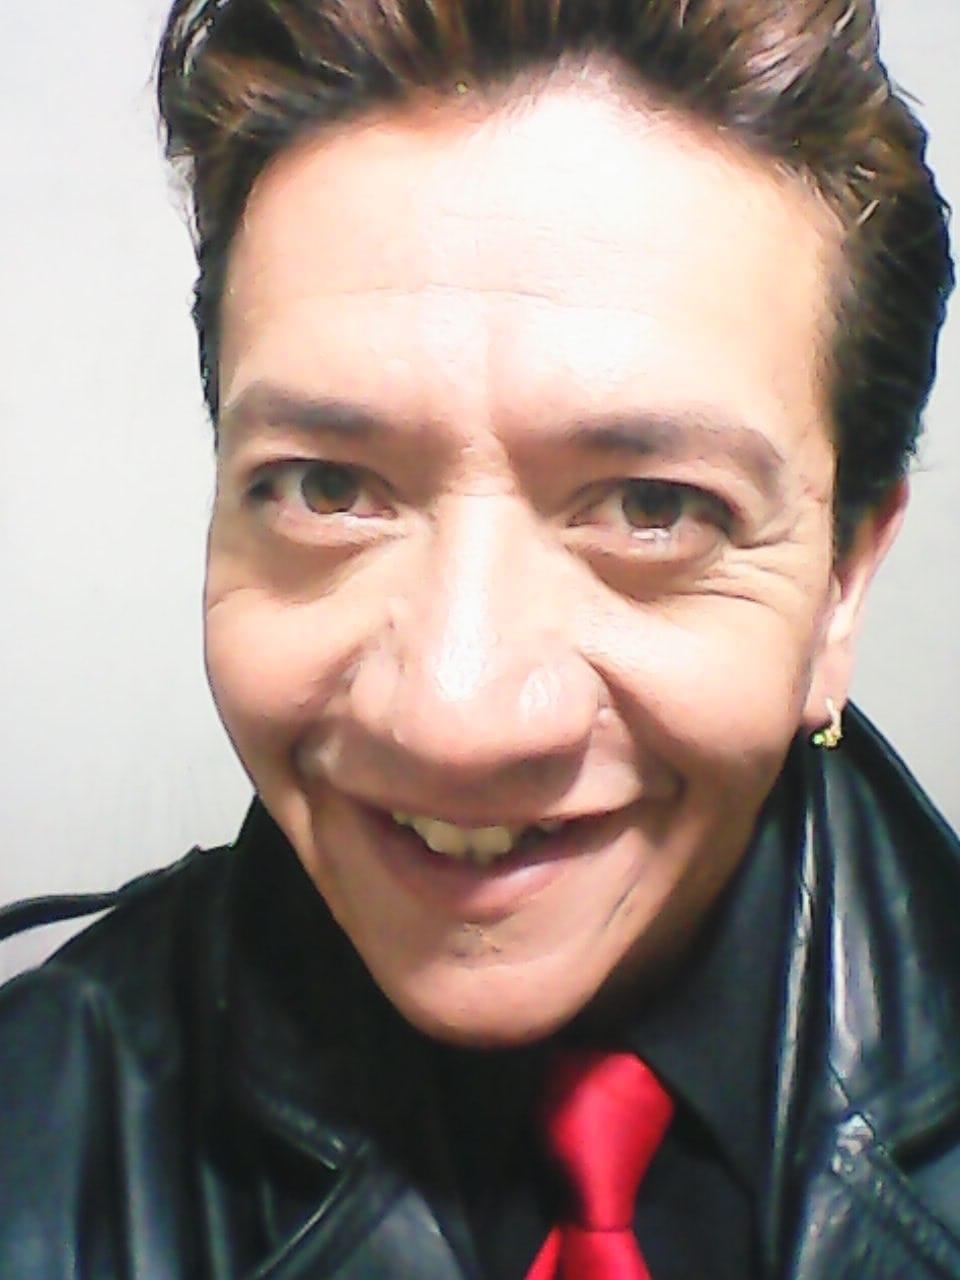 Francisco Klee